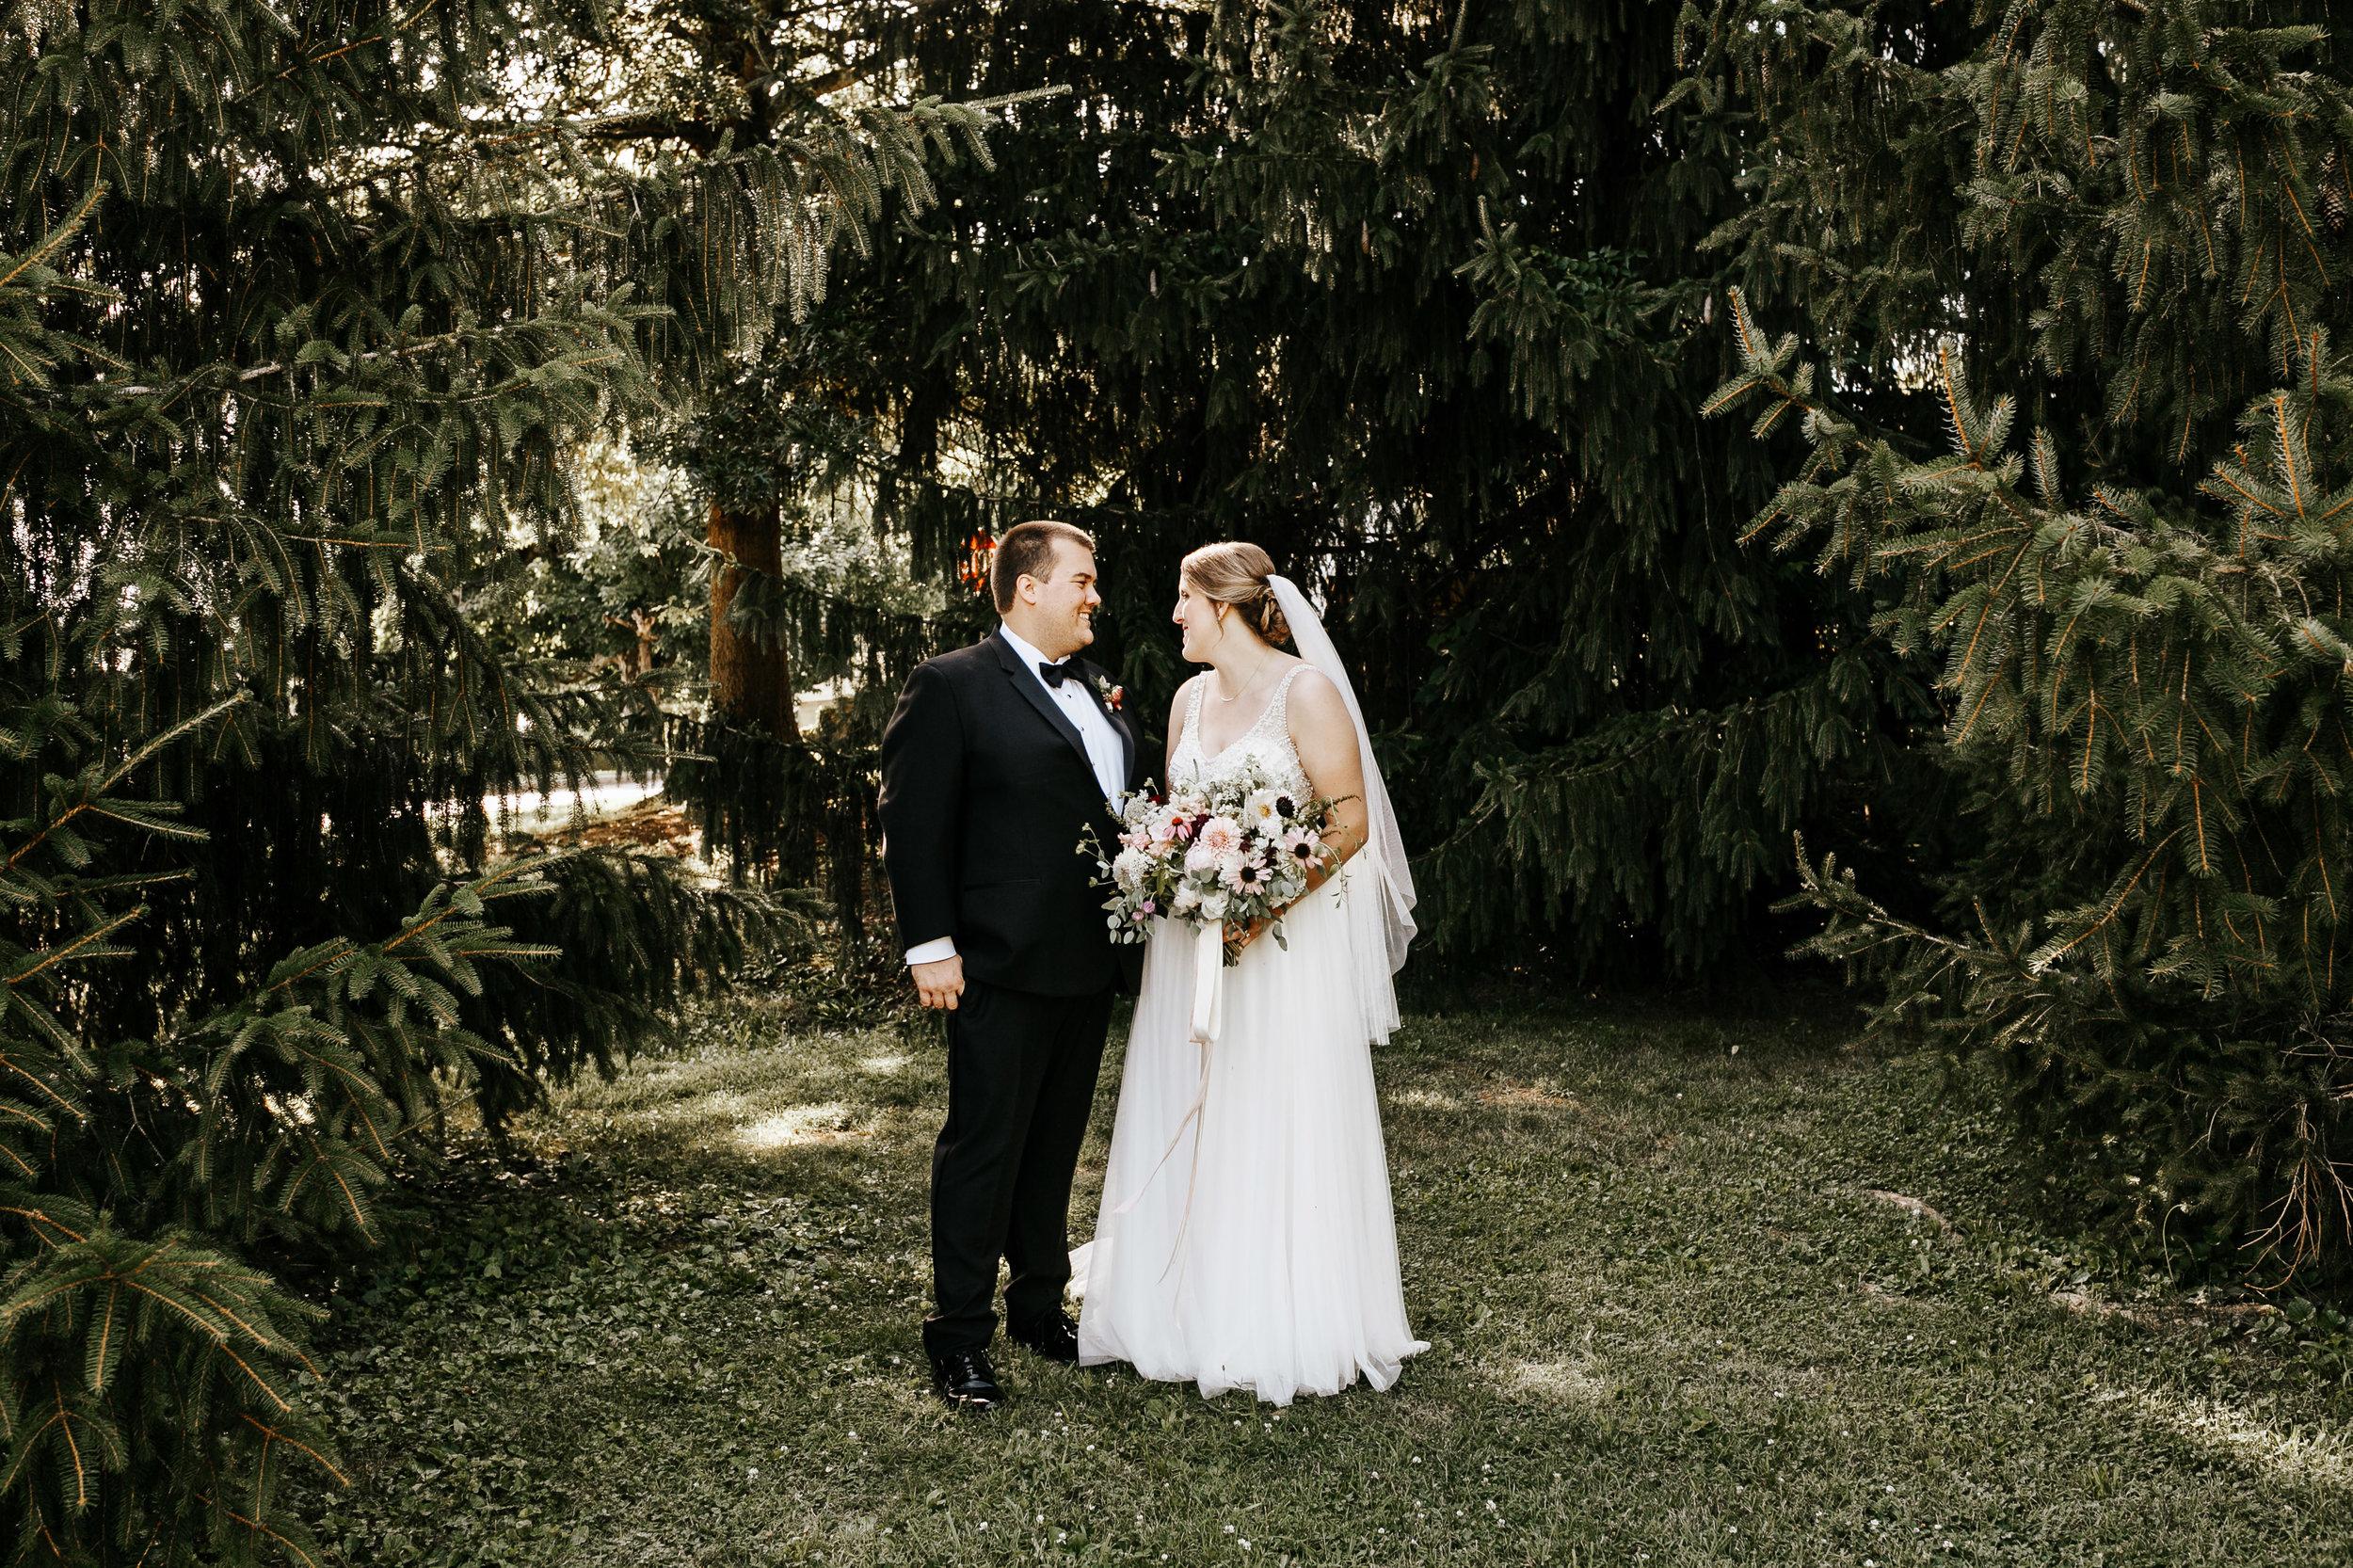 bohemian-photographer-wedding-tennessee-38.jpg